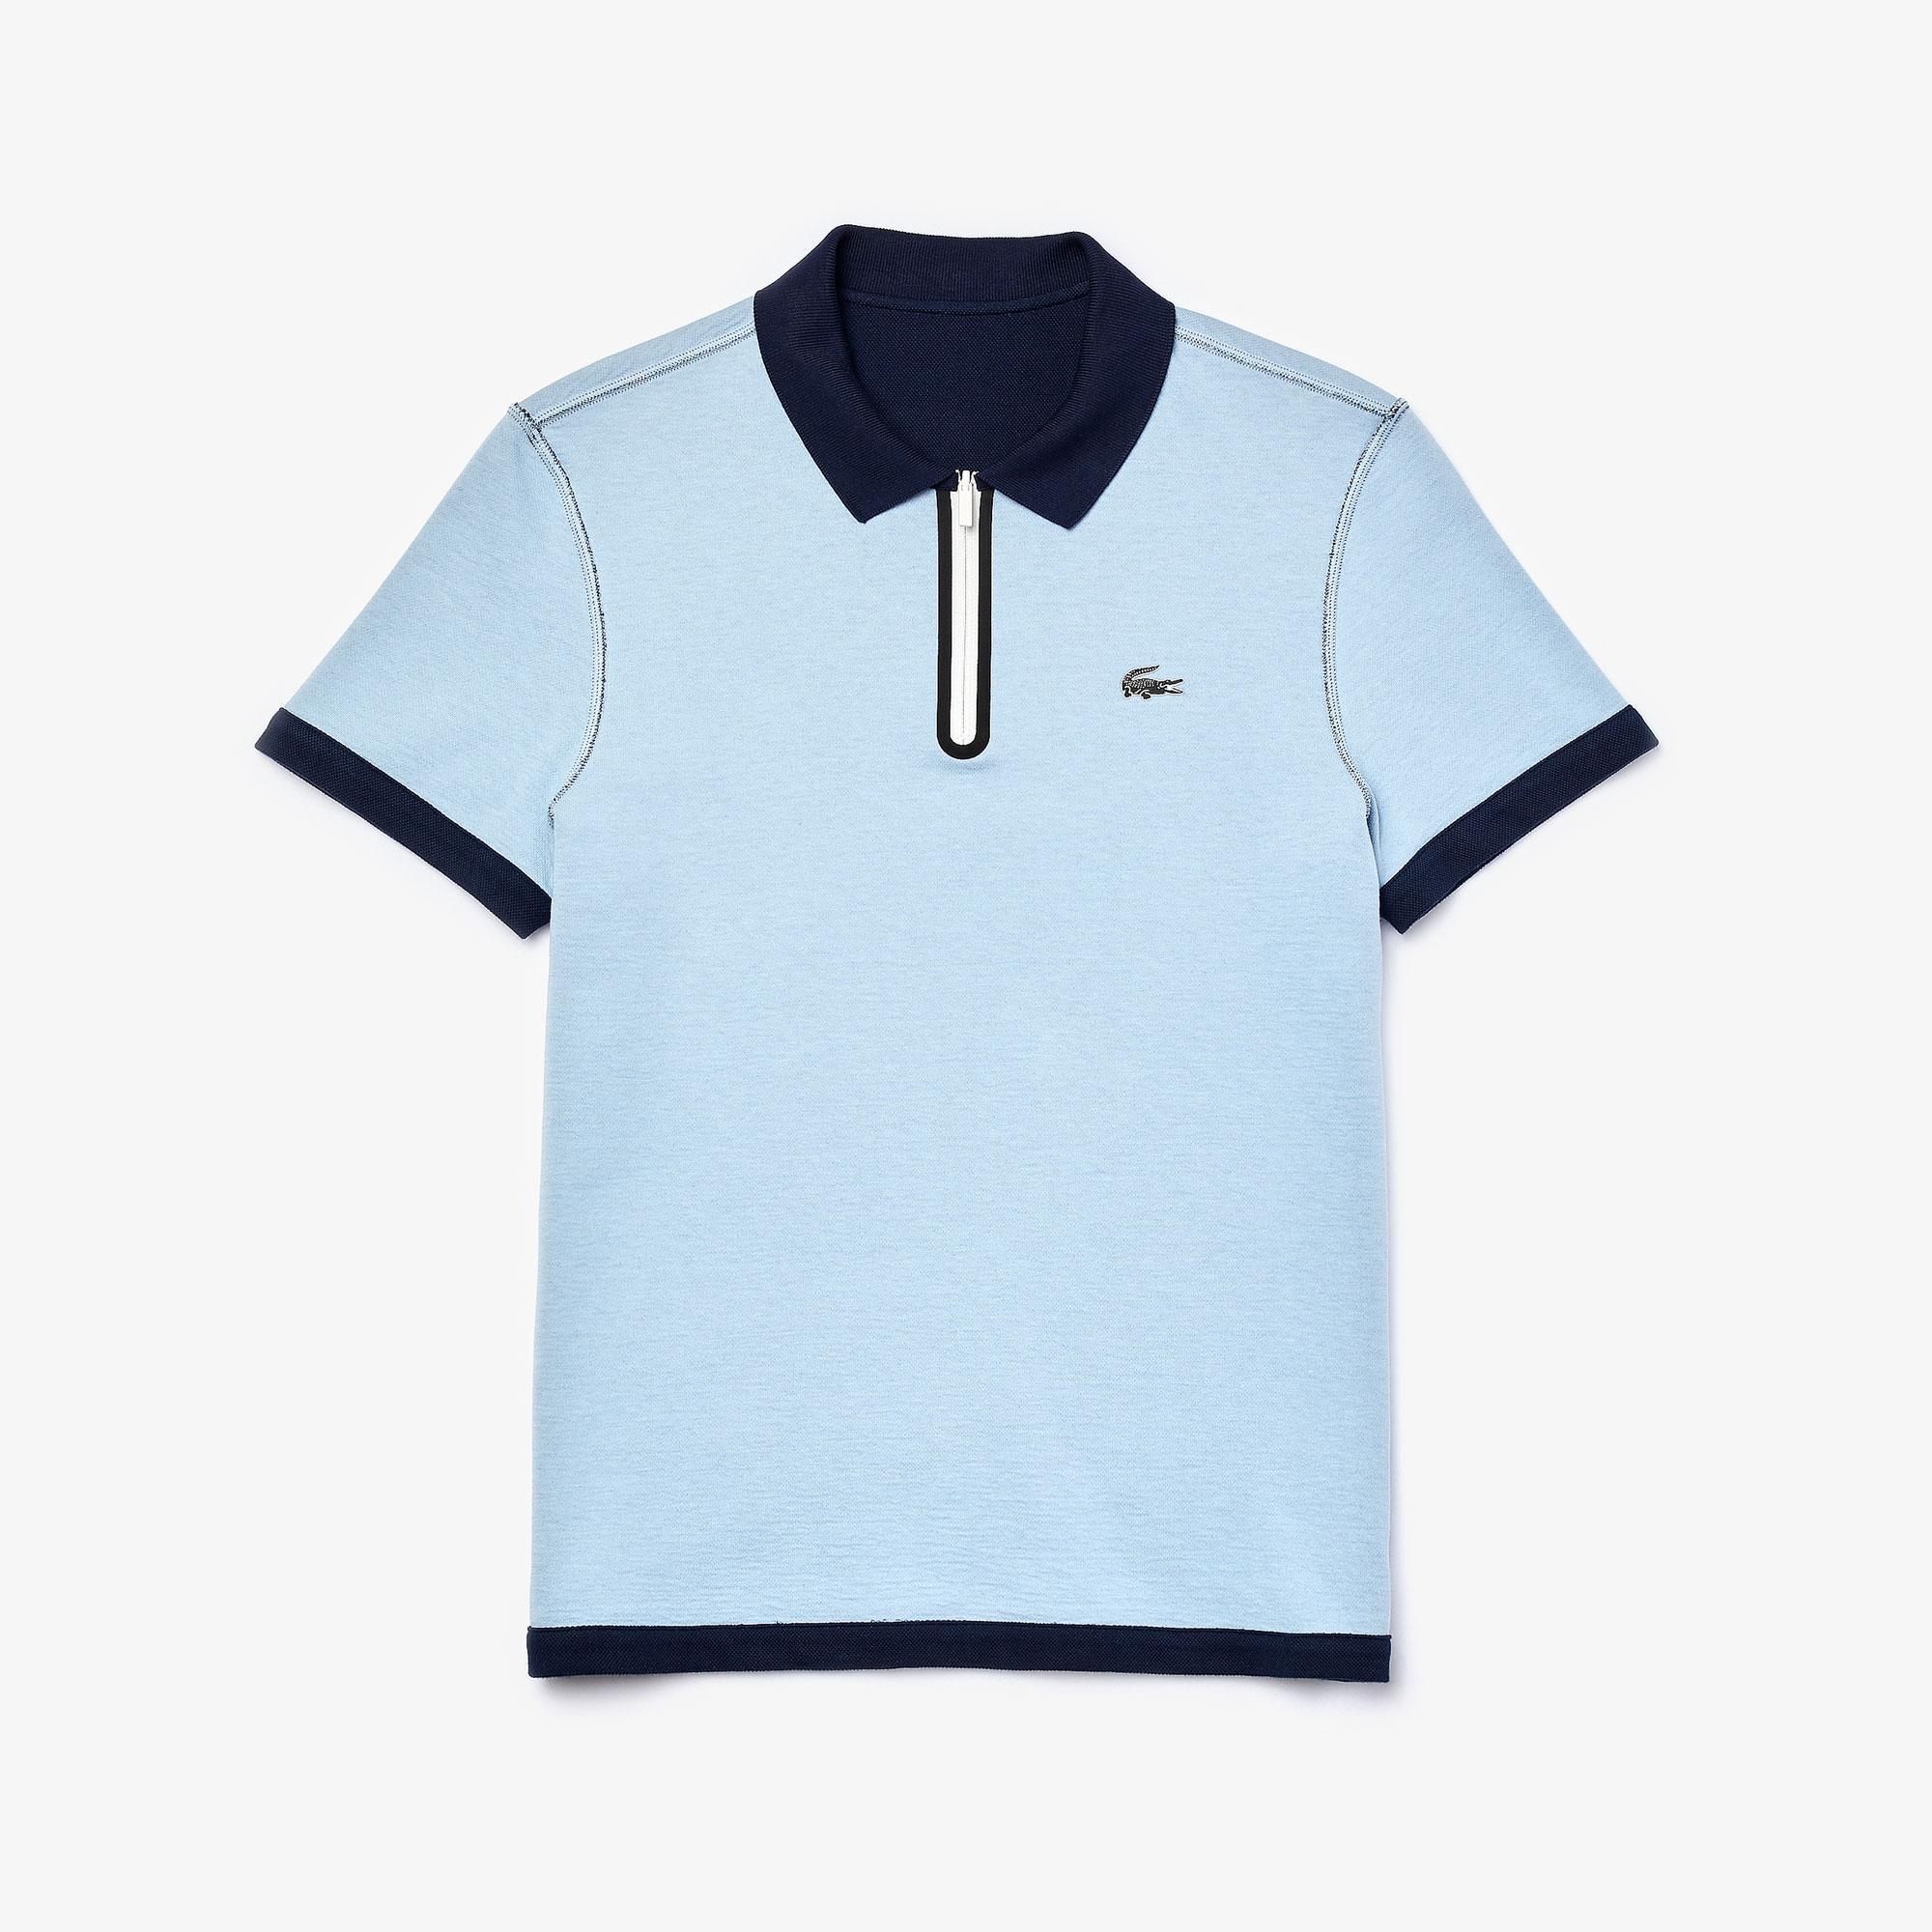 Lacoste Men's Zippered Collar Regular Fit Reversible Piqué Polo Shirt